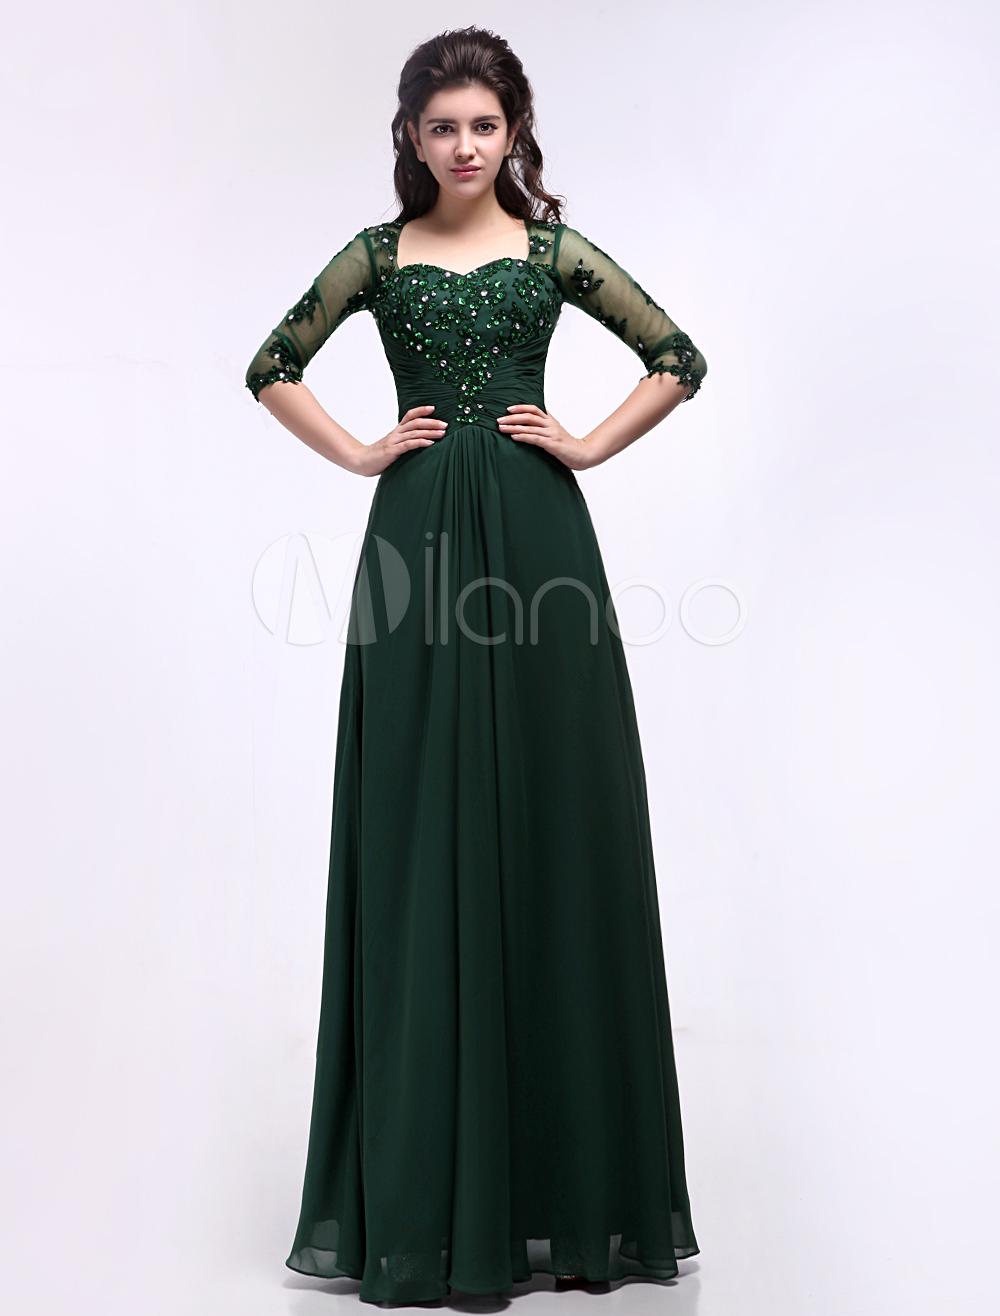 Dark Green A-line Sweetheart Neck Applique Chiffon Bridal Mother Dress with Half Sleeves (Wedding) photo